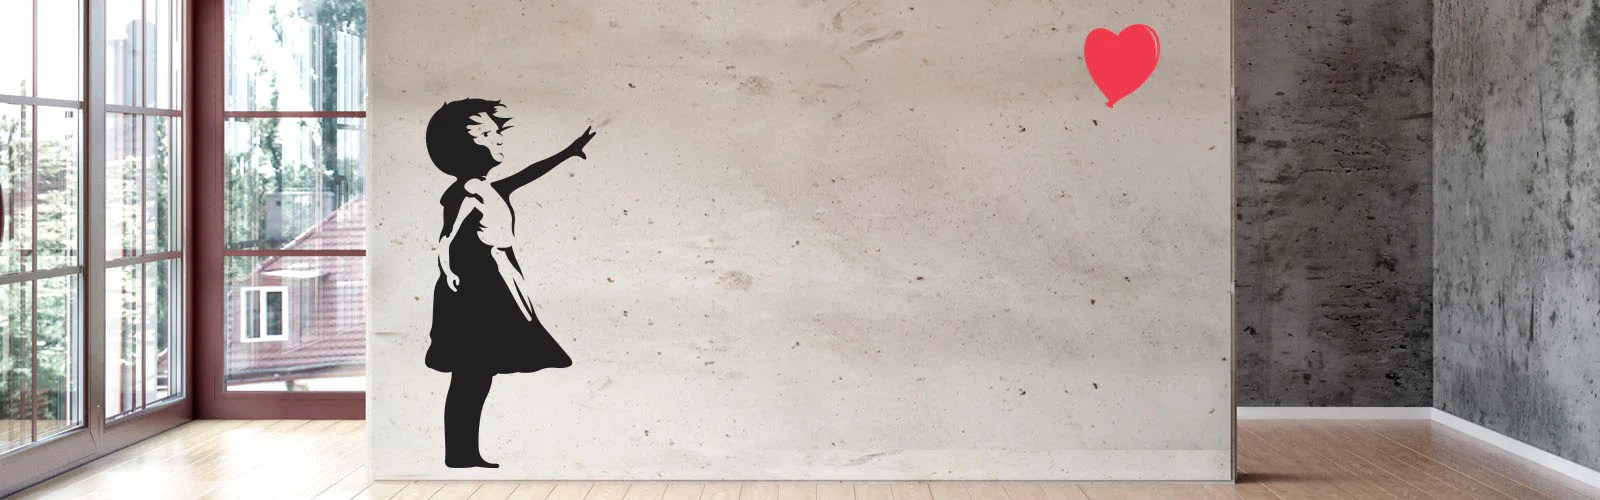 Banksy Vinyl Wall Decals  WallsNeedLove